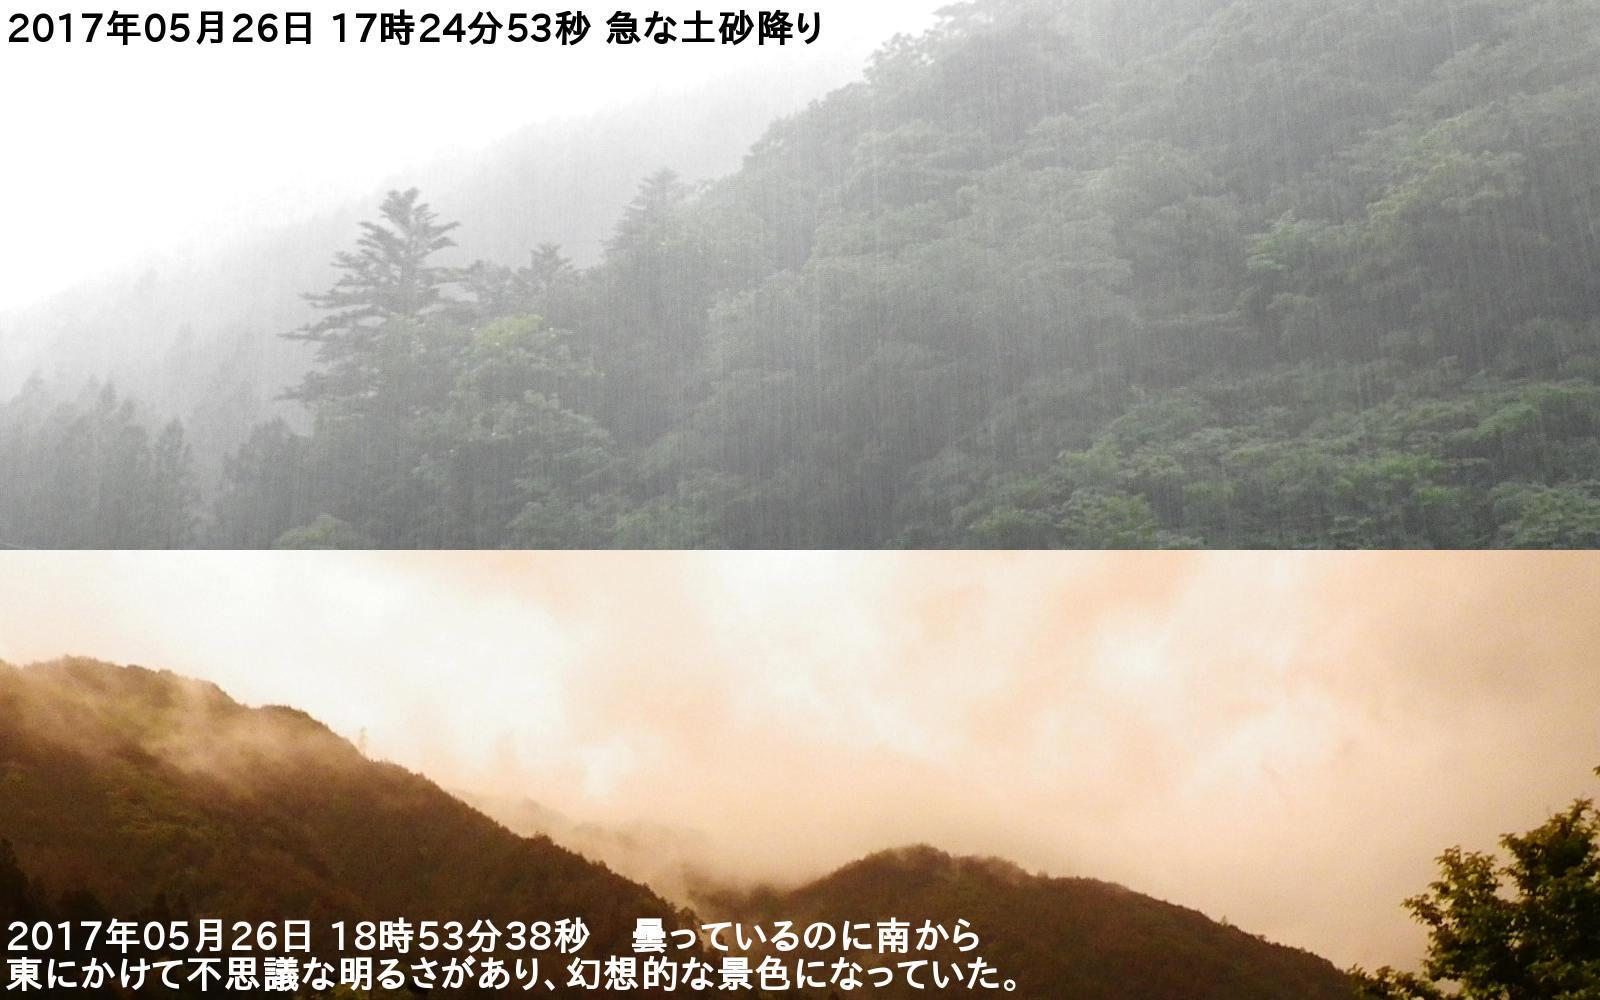 170526_downpour.jpg